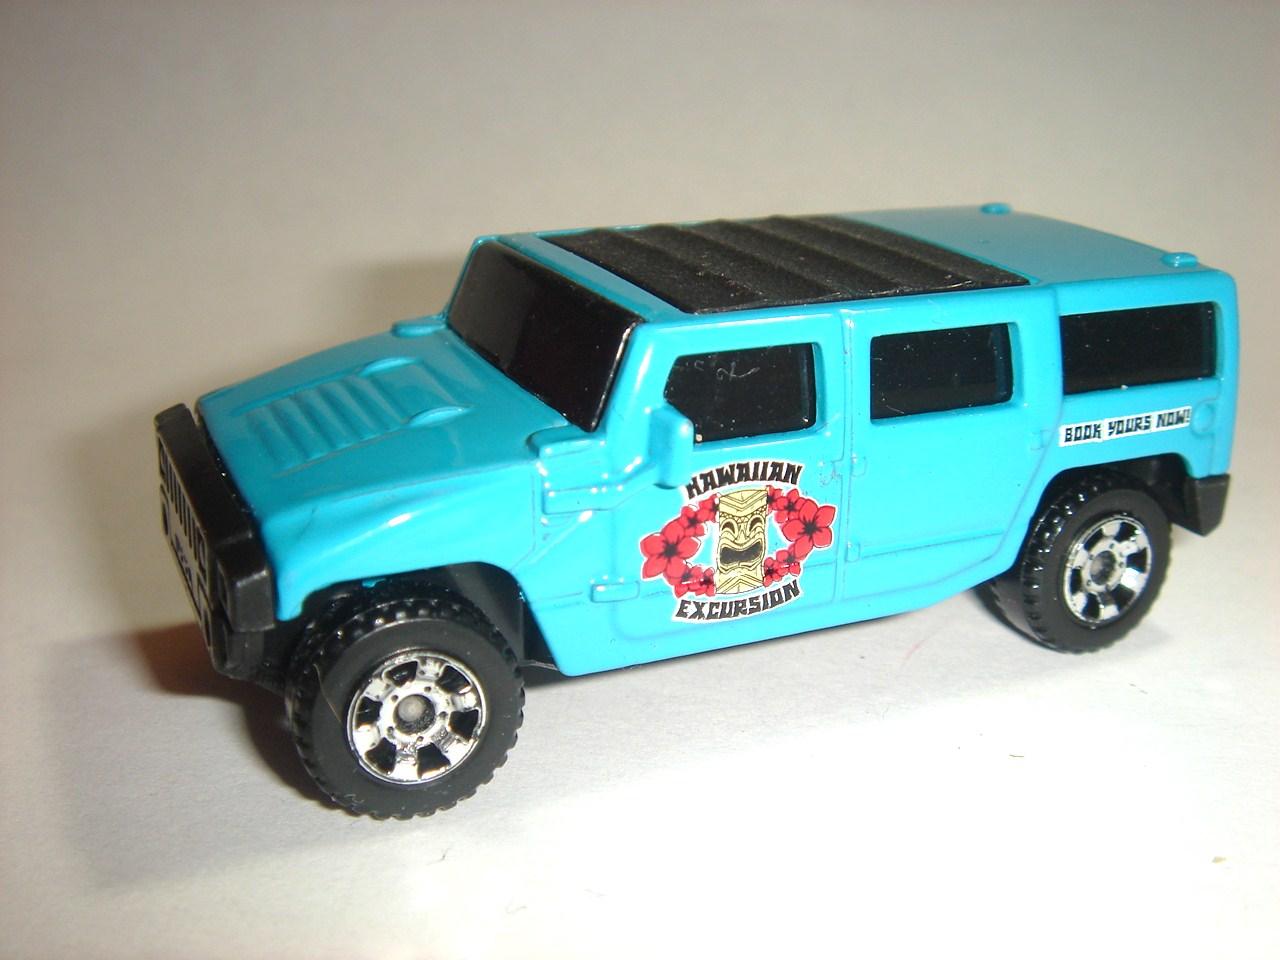 Hummer H2 Suv Concept Matchbox Cars Wiki Fandom